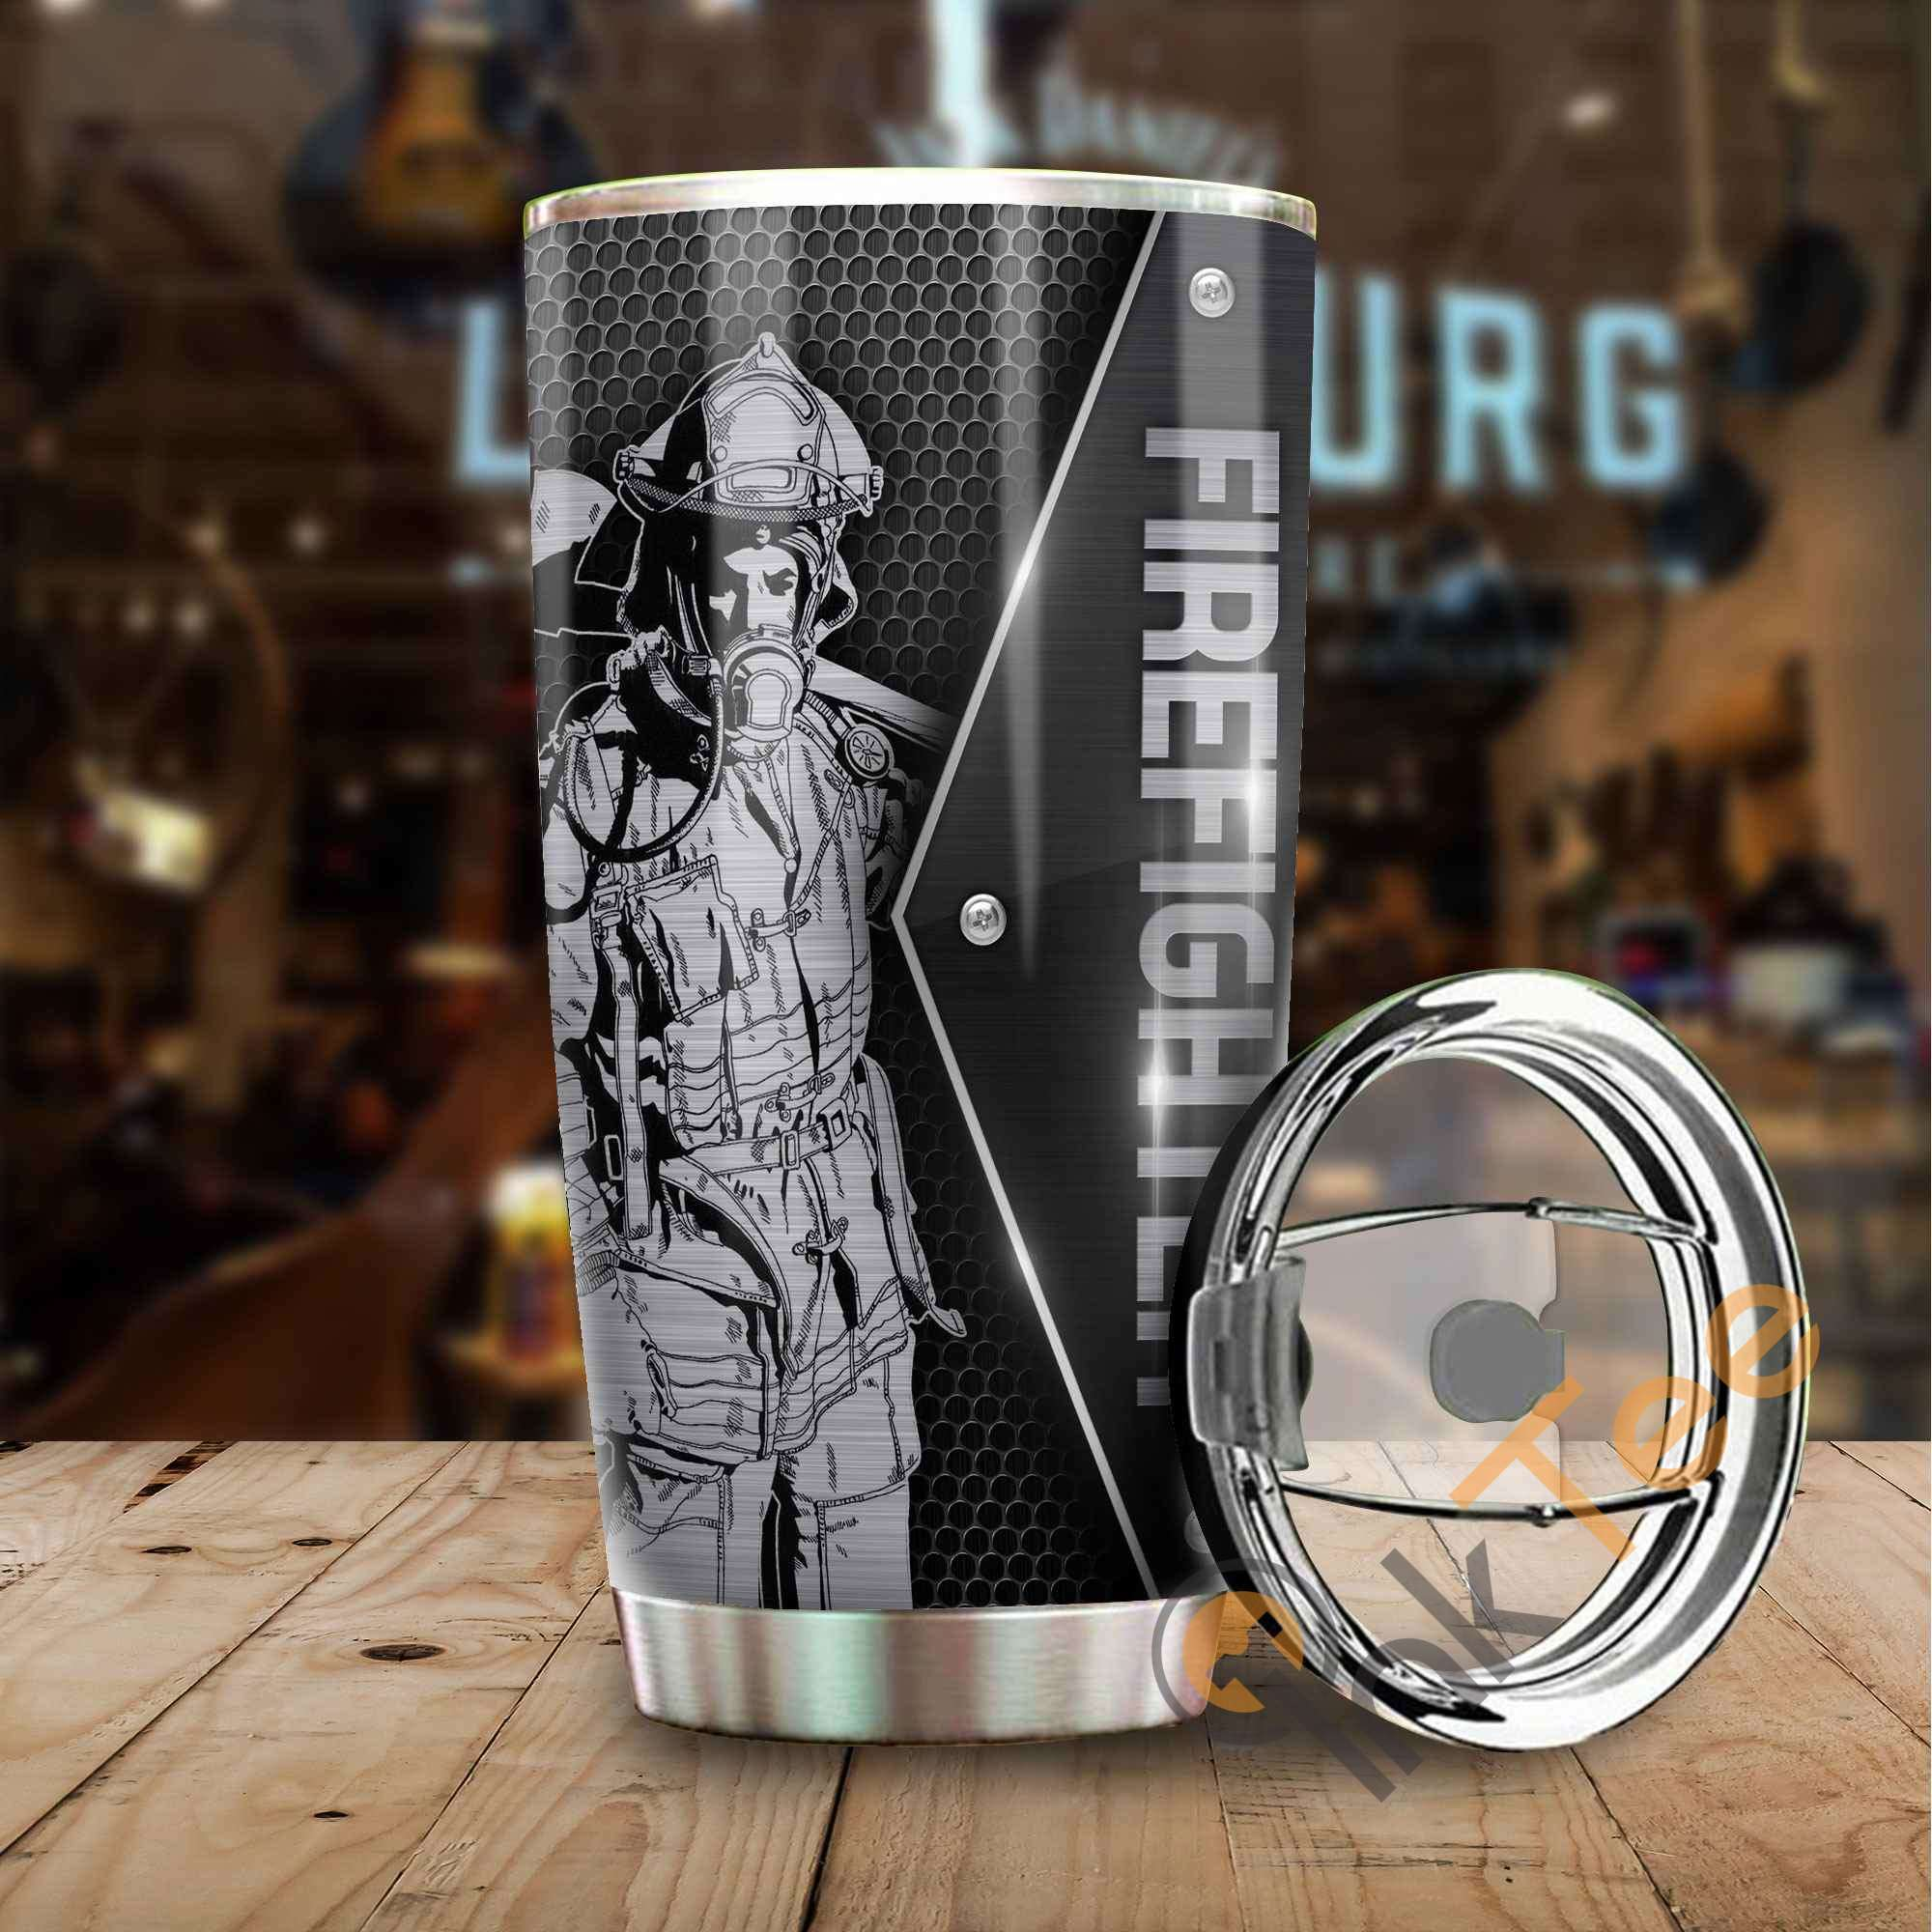 Firefighter Metal Amazon Best Seller Sku 3850 Stainless Steel Tumbler